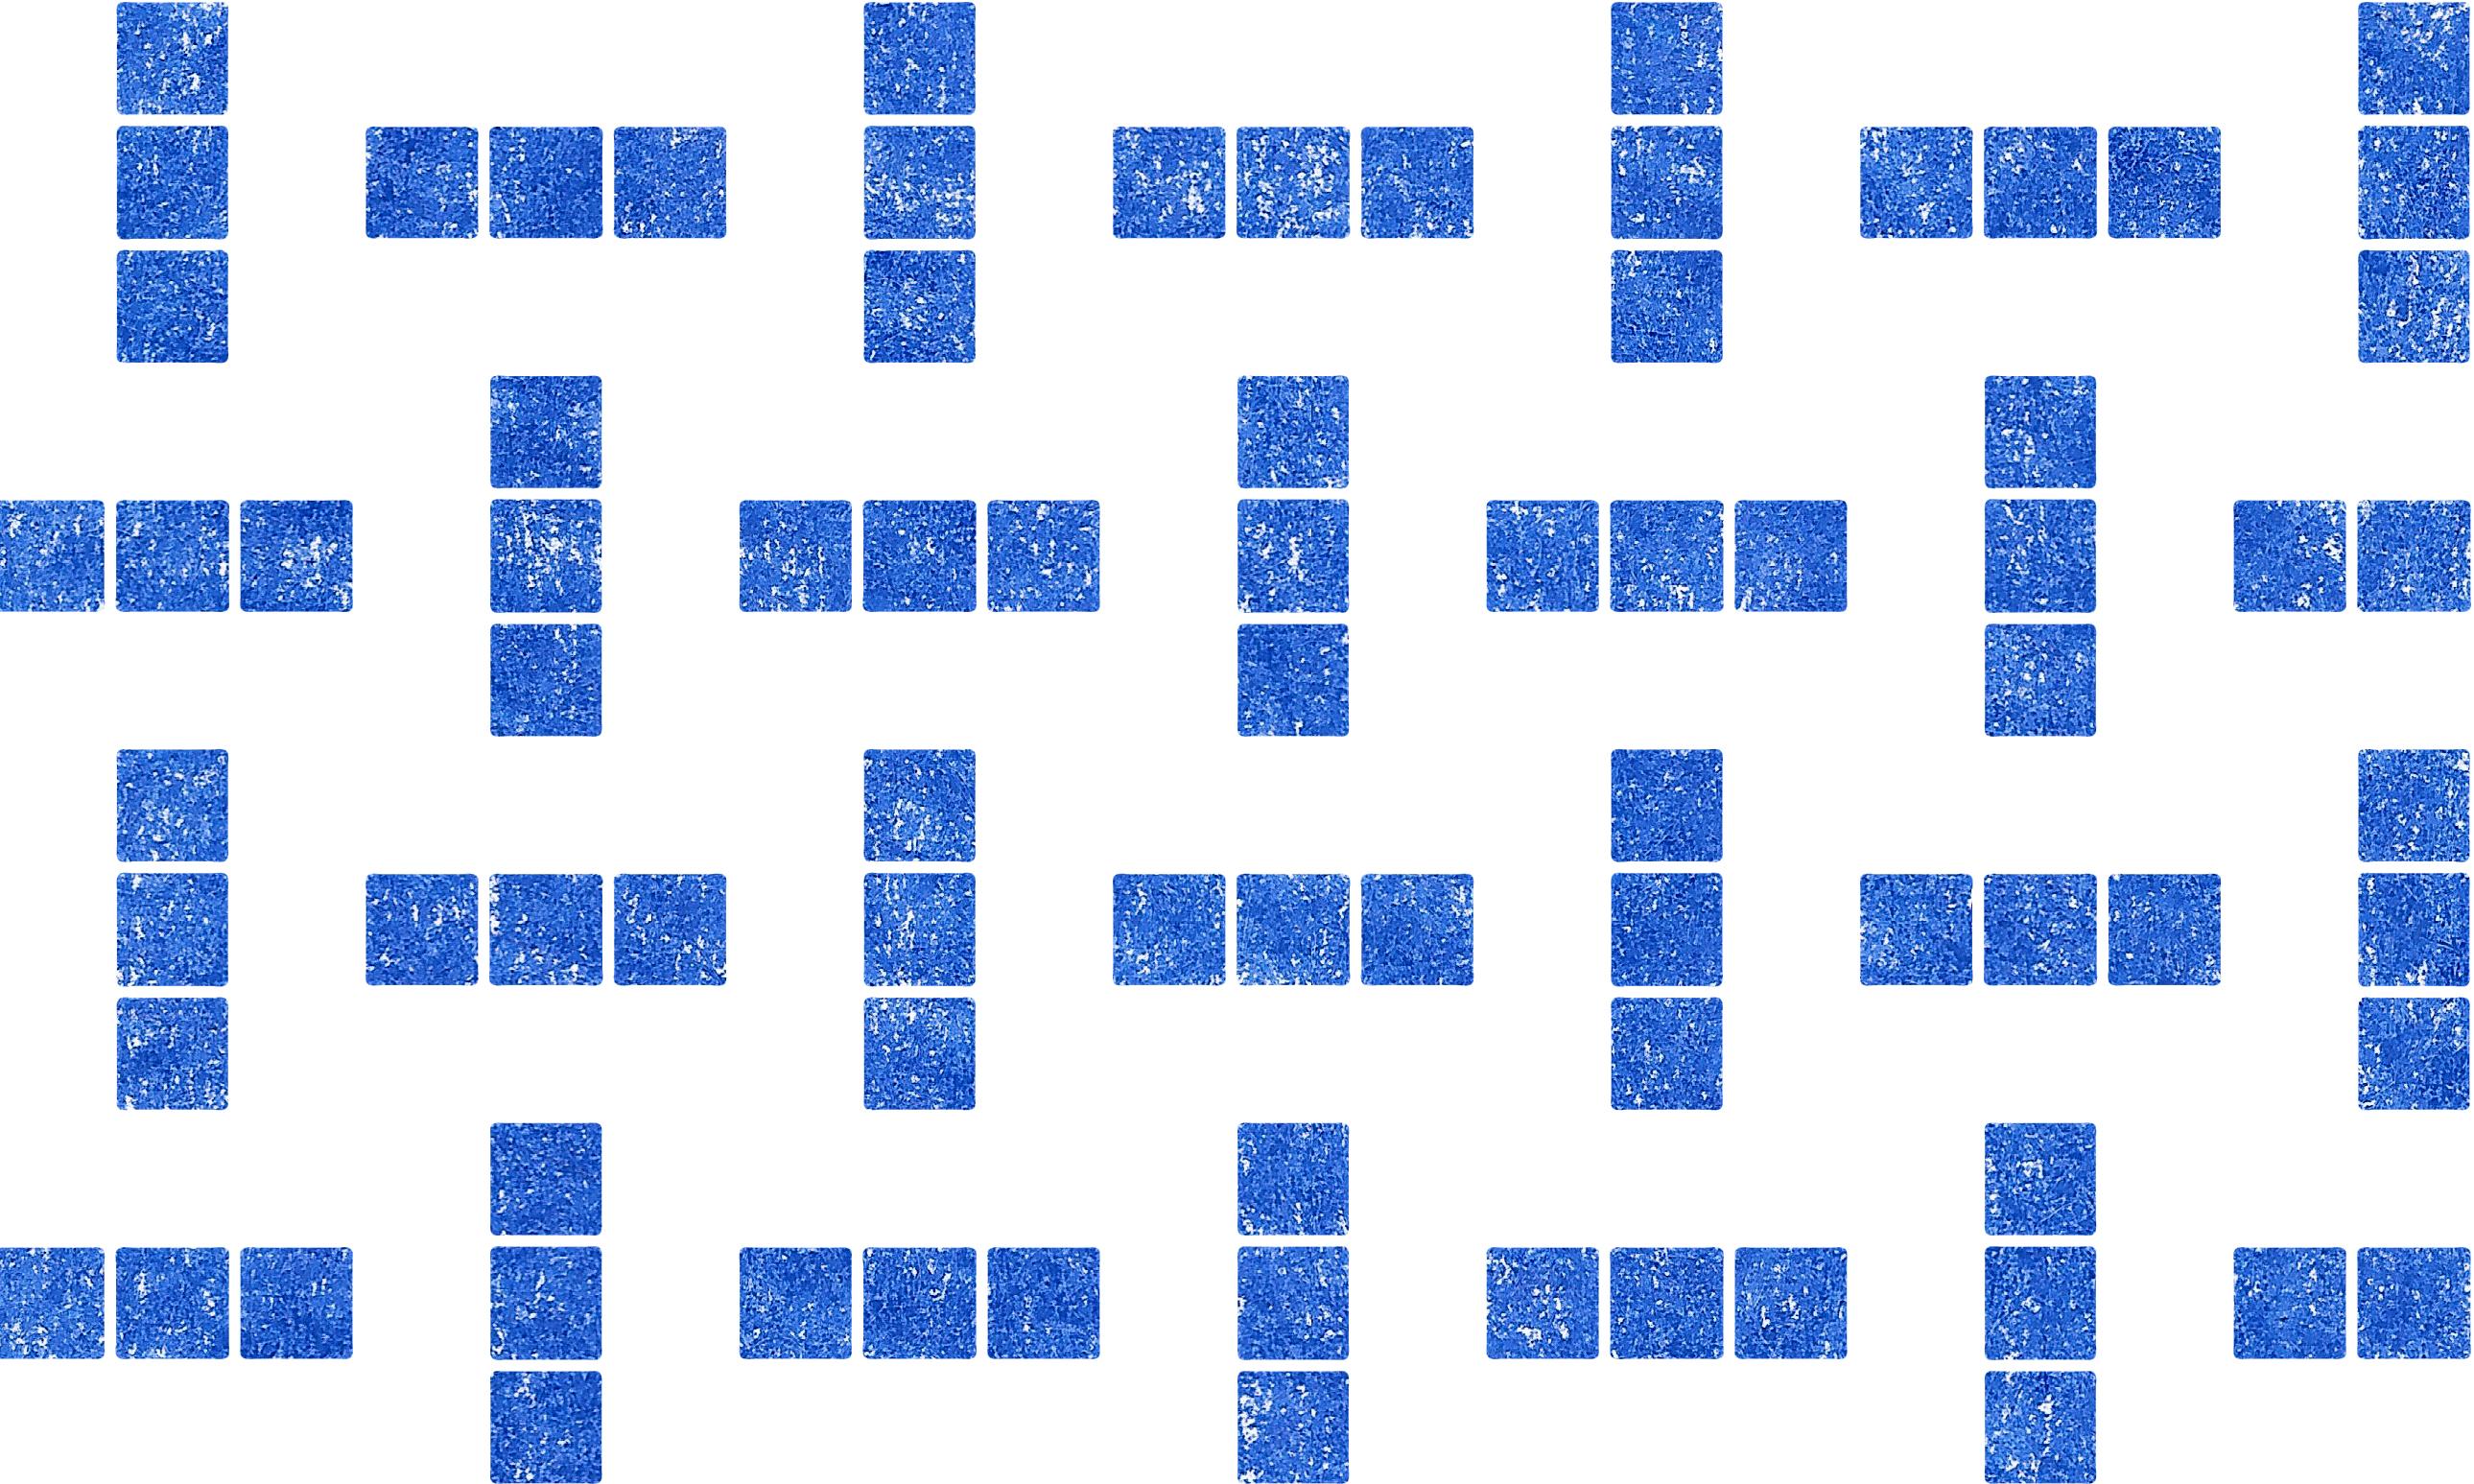 4_motif-1506941819.jpg